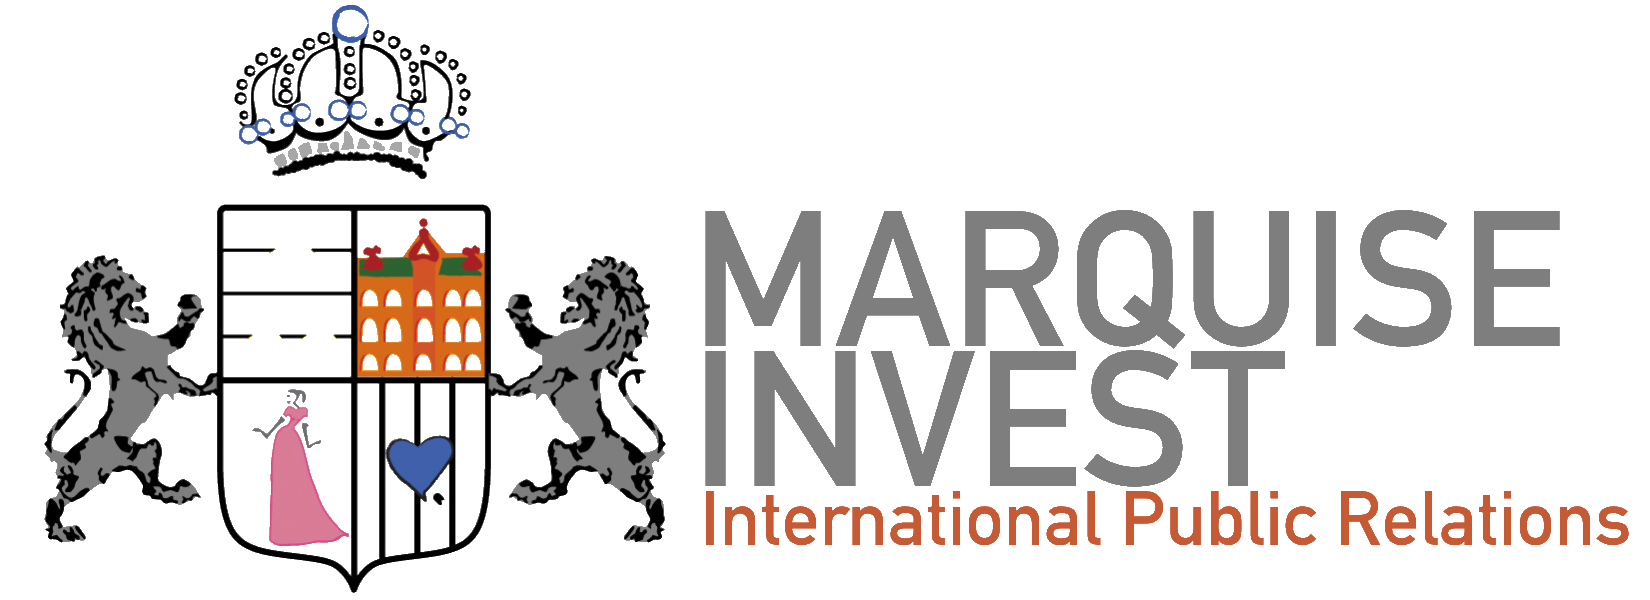 Marquise Invest